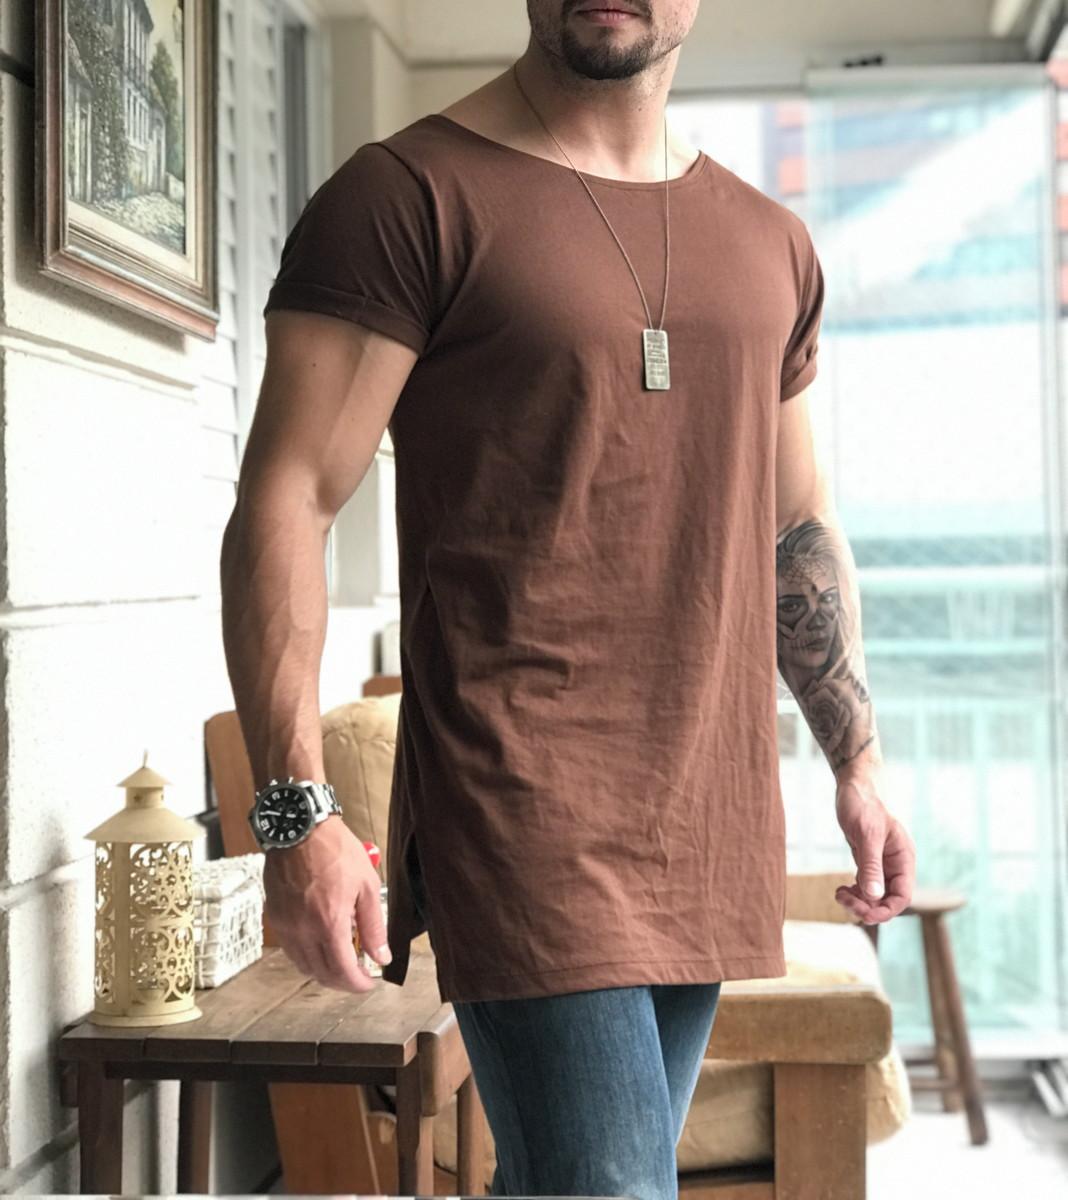 62399cb6a6 Camiseta Longline Sidecut Marrom Masculina no Elo7